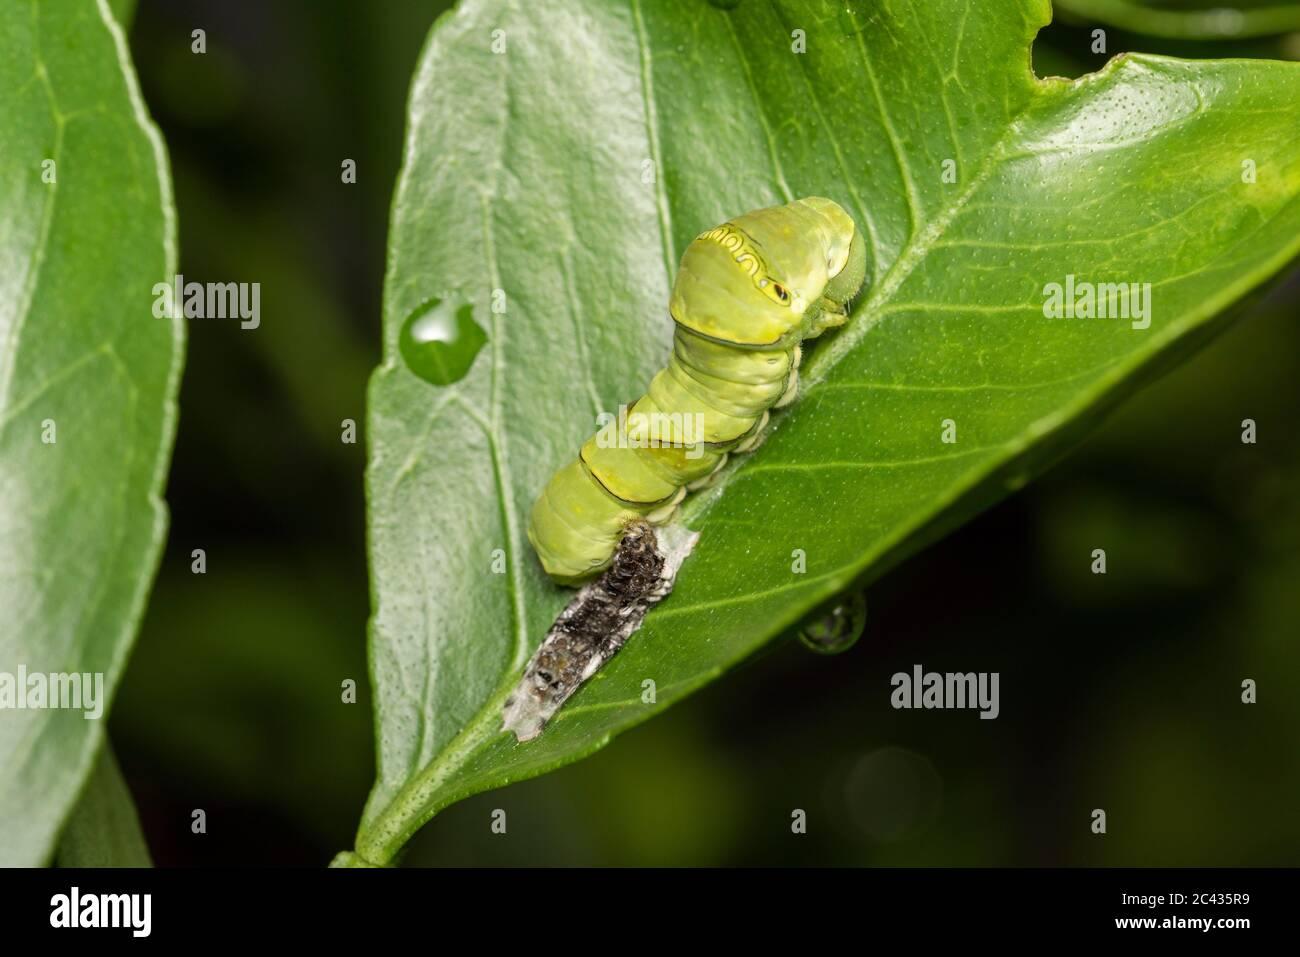 Larva of Asian swallowtail (Papilio xuthus) just molted, on Mikan orange tree, Isehara City, Kanagawa Prefecture ,Japan Stock Photo